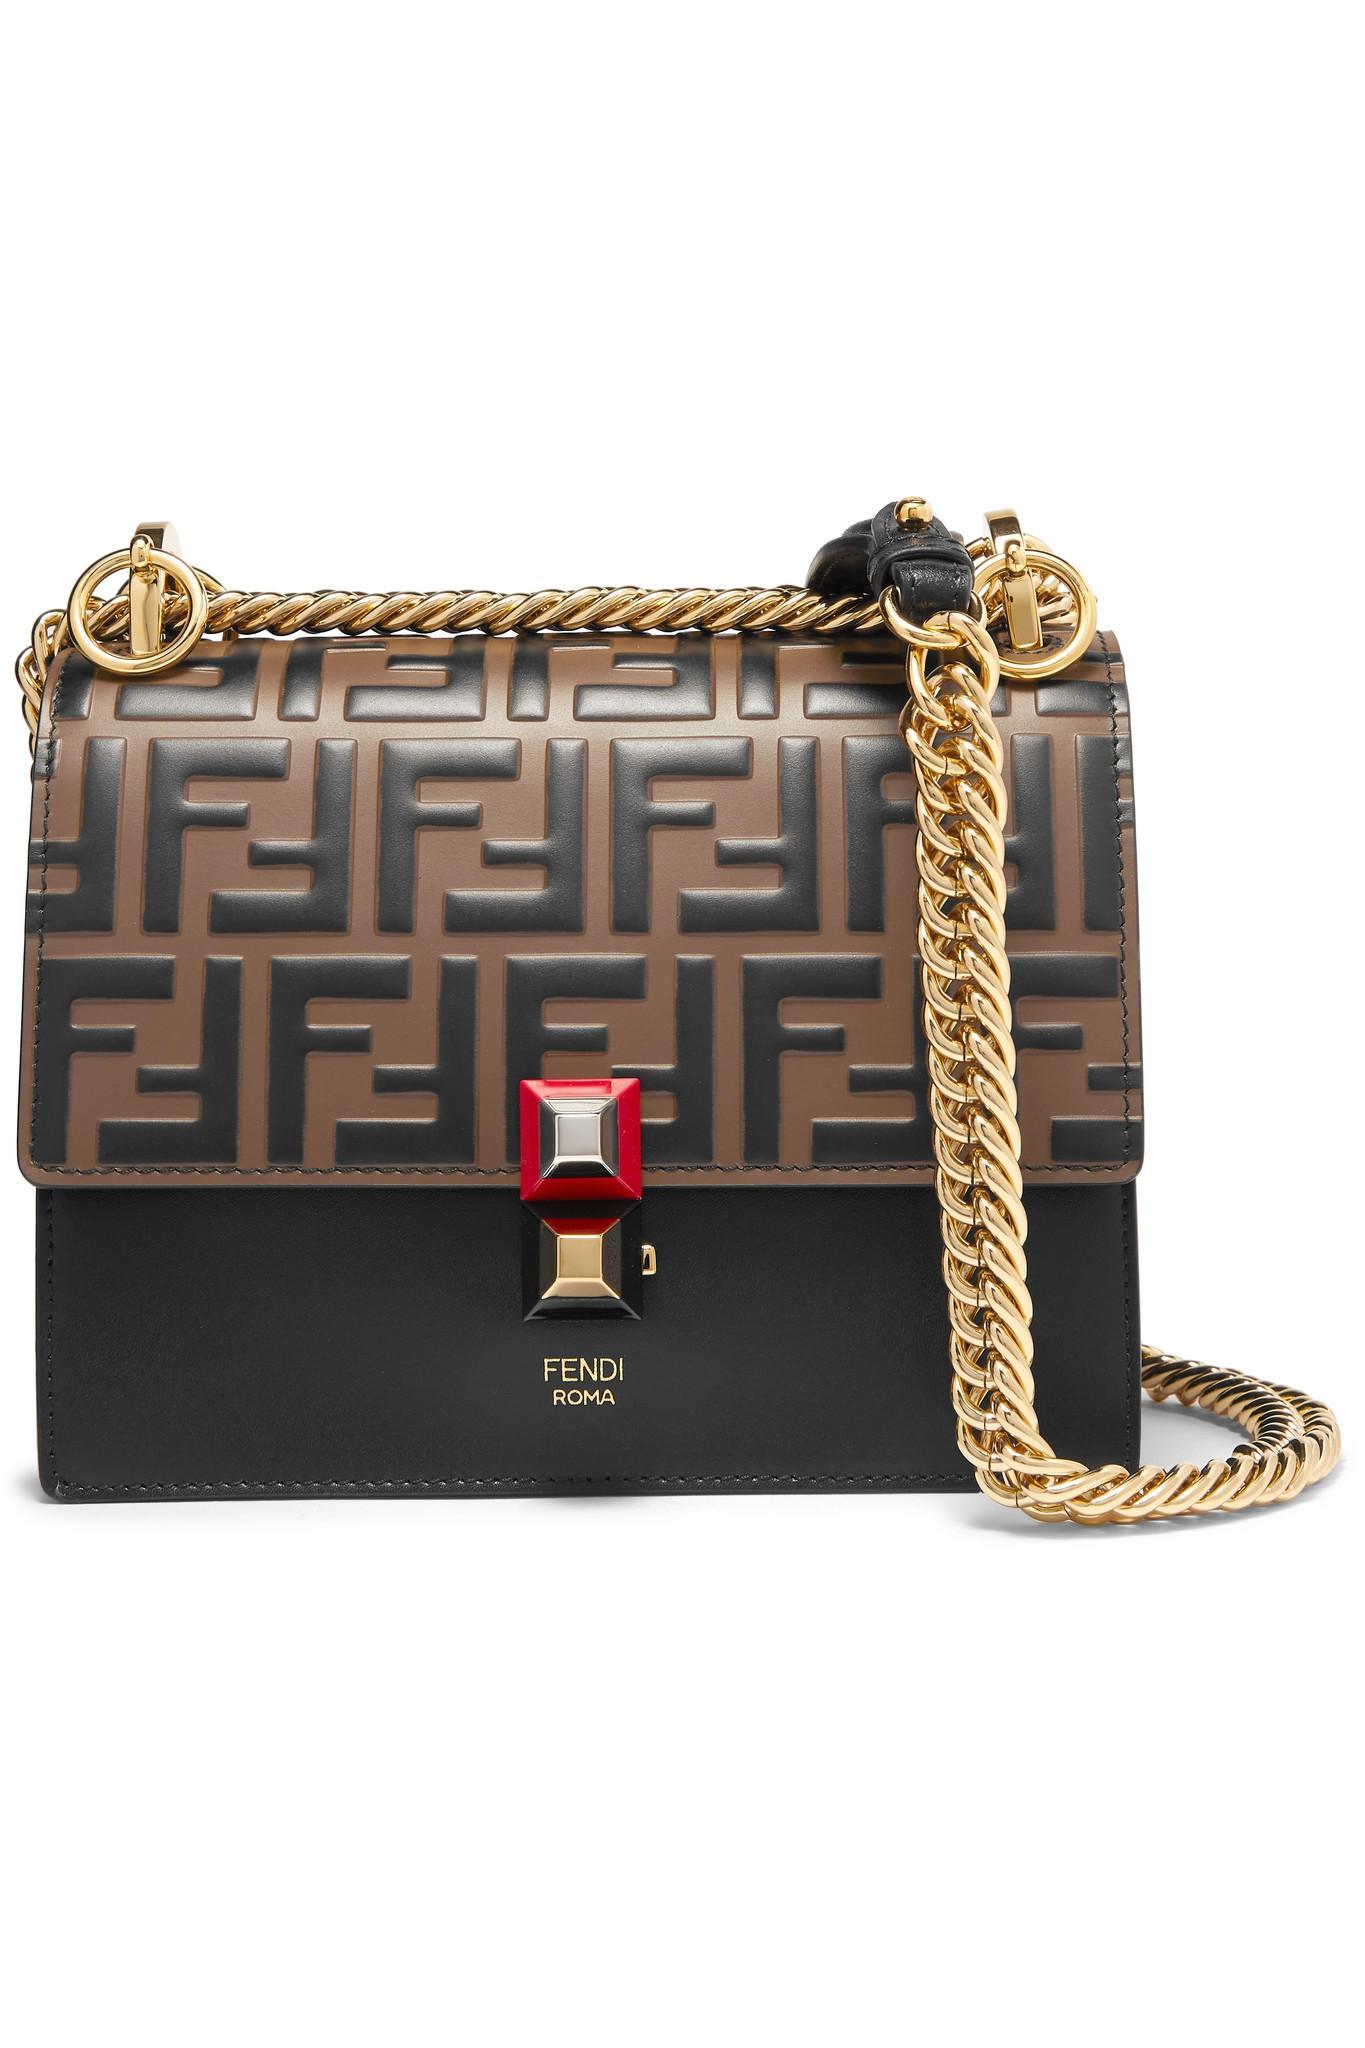 874c03650f Fendi Kan I Small Embossed Leather Shoulder Bag in Black - Lyst